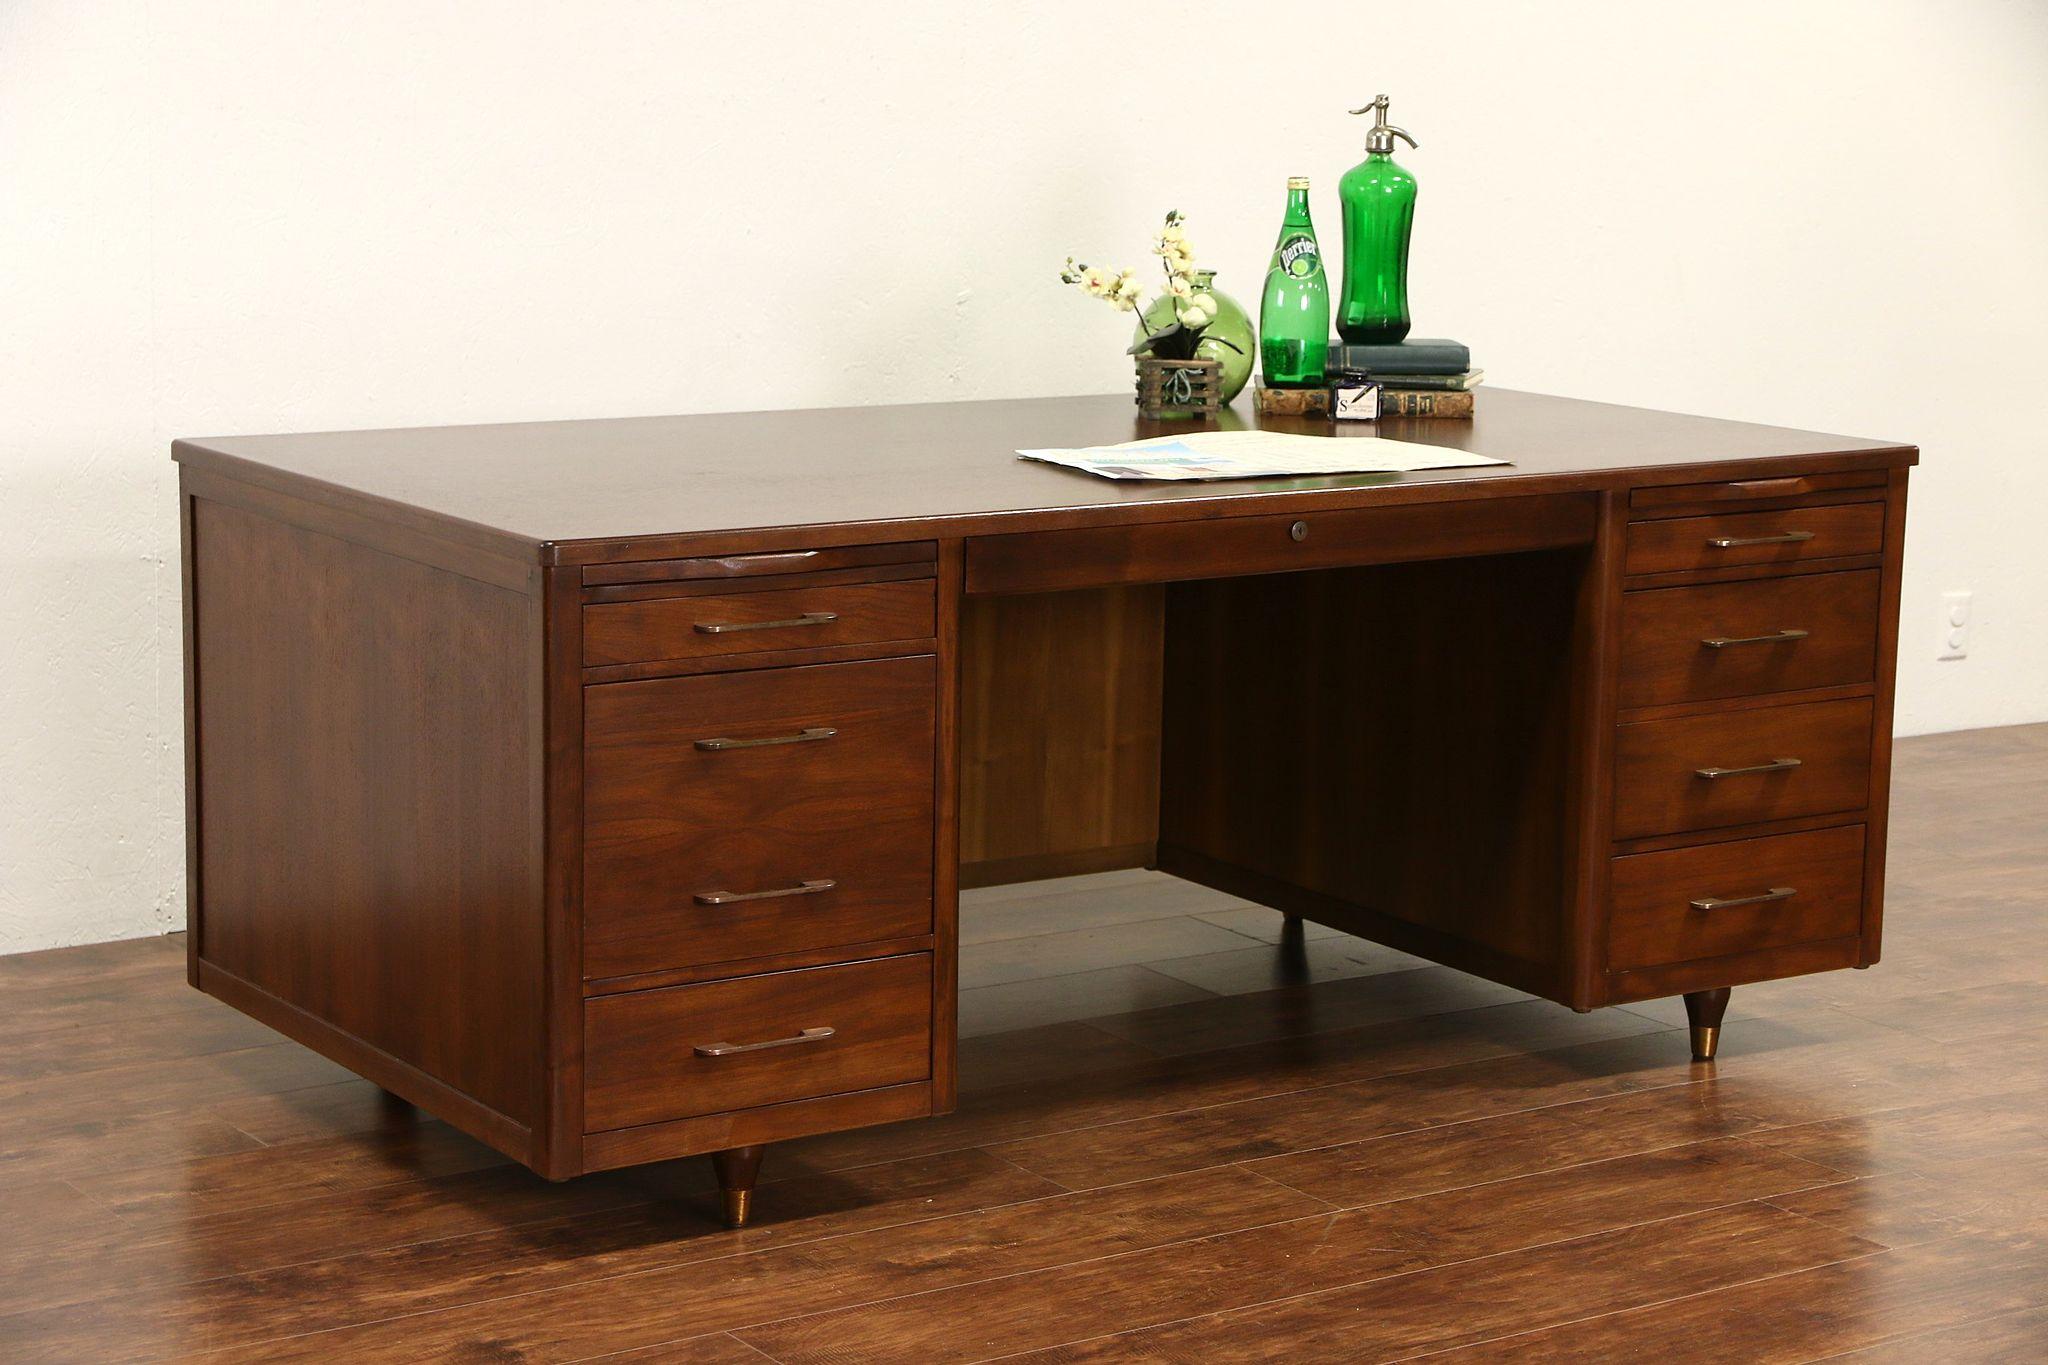 Sold Midcentury Modern 1960 Vintage Walnut Executive Desk Harp